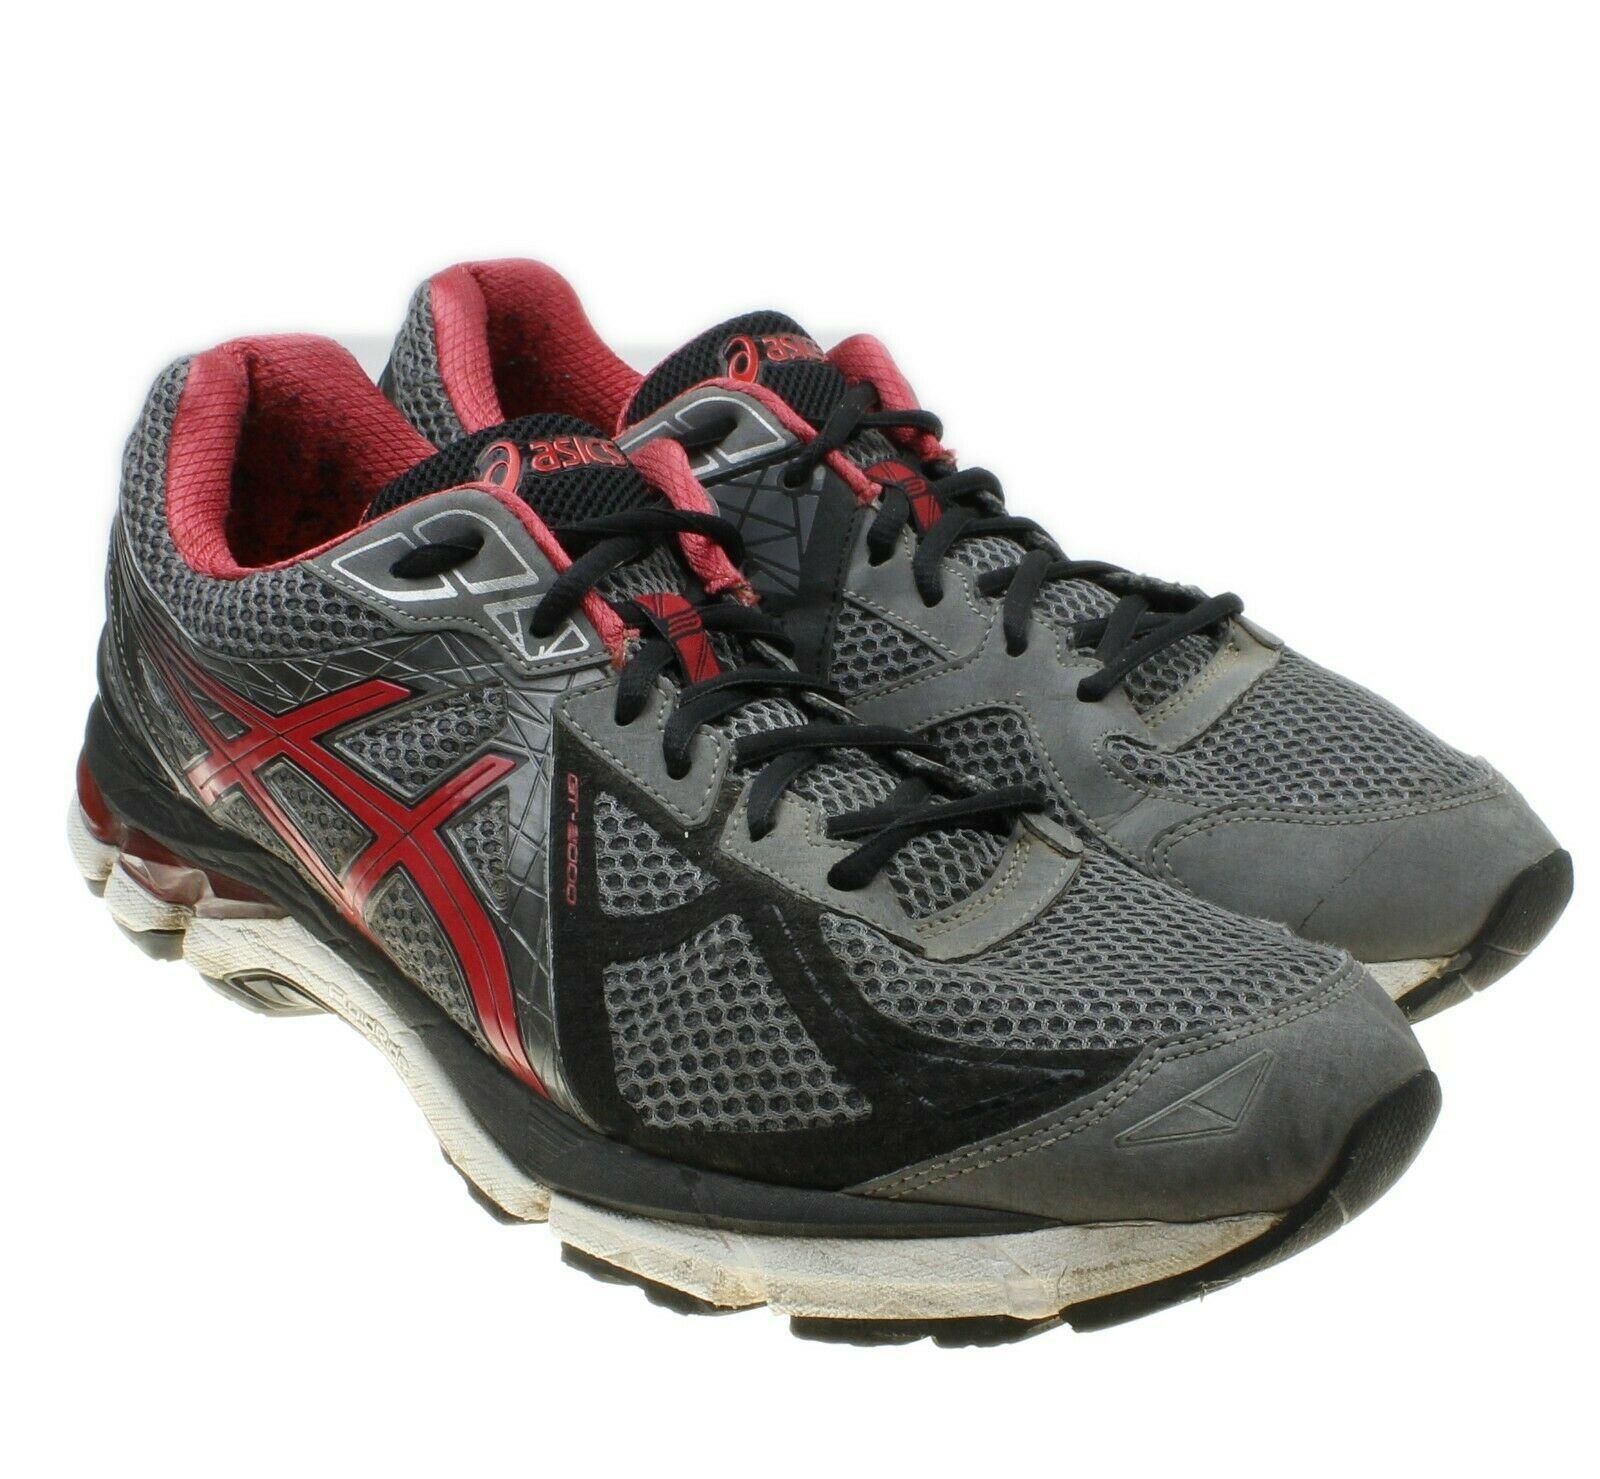 Asics GT 2000 v 3 Gray Mens Size 11.5 EU 46 Running Shoes Sneakers T500N